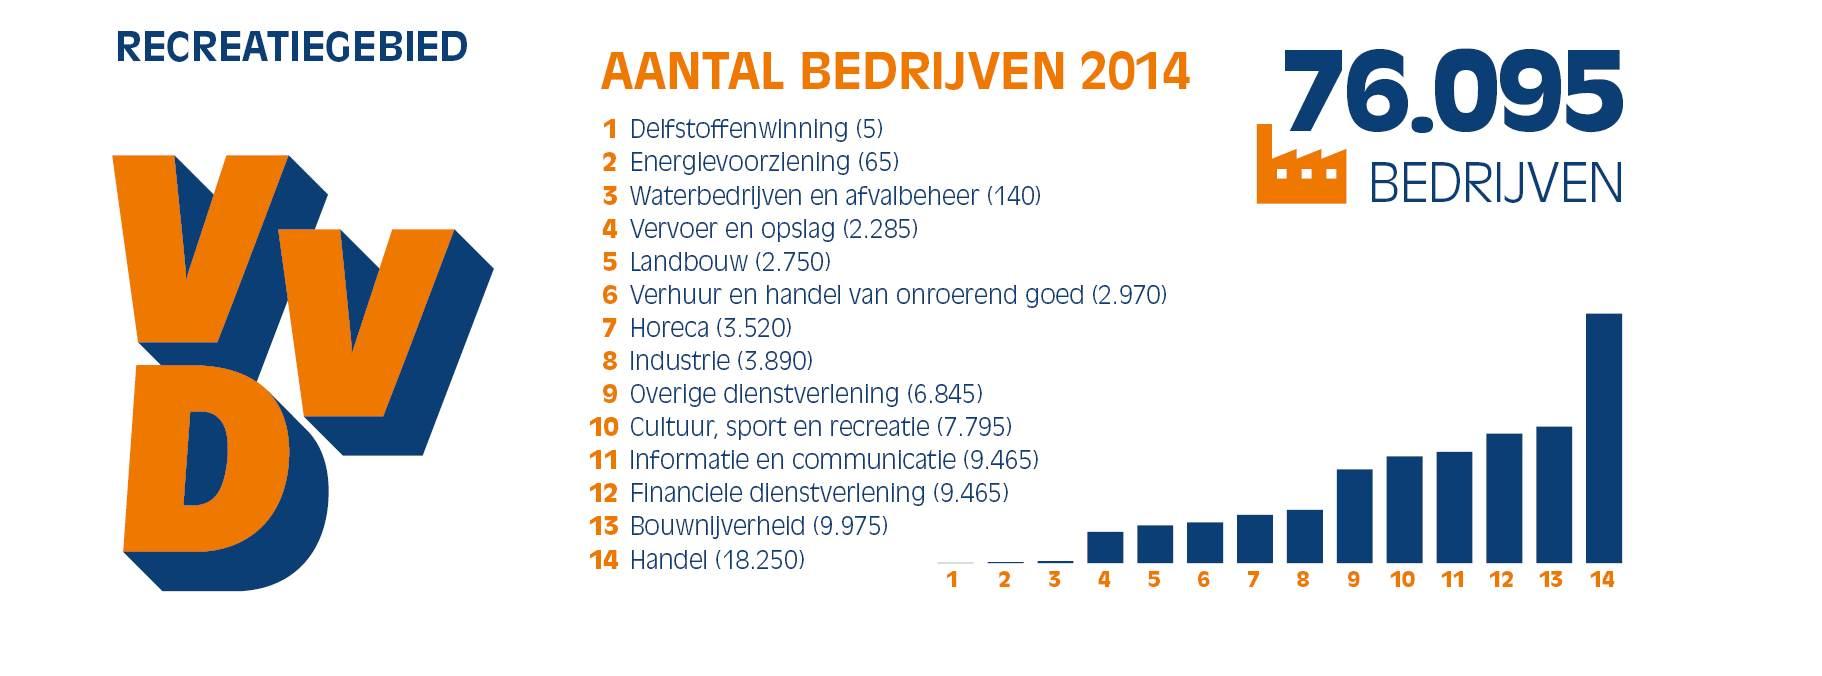 Thumbnail Utrecht in cijfers infographic